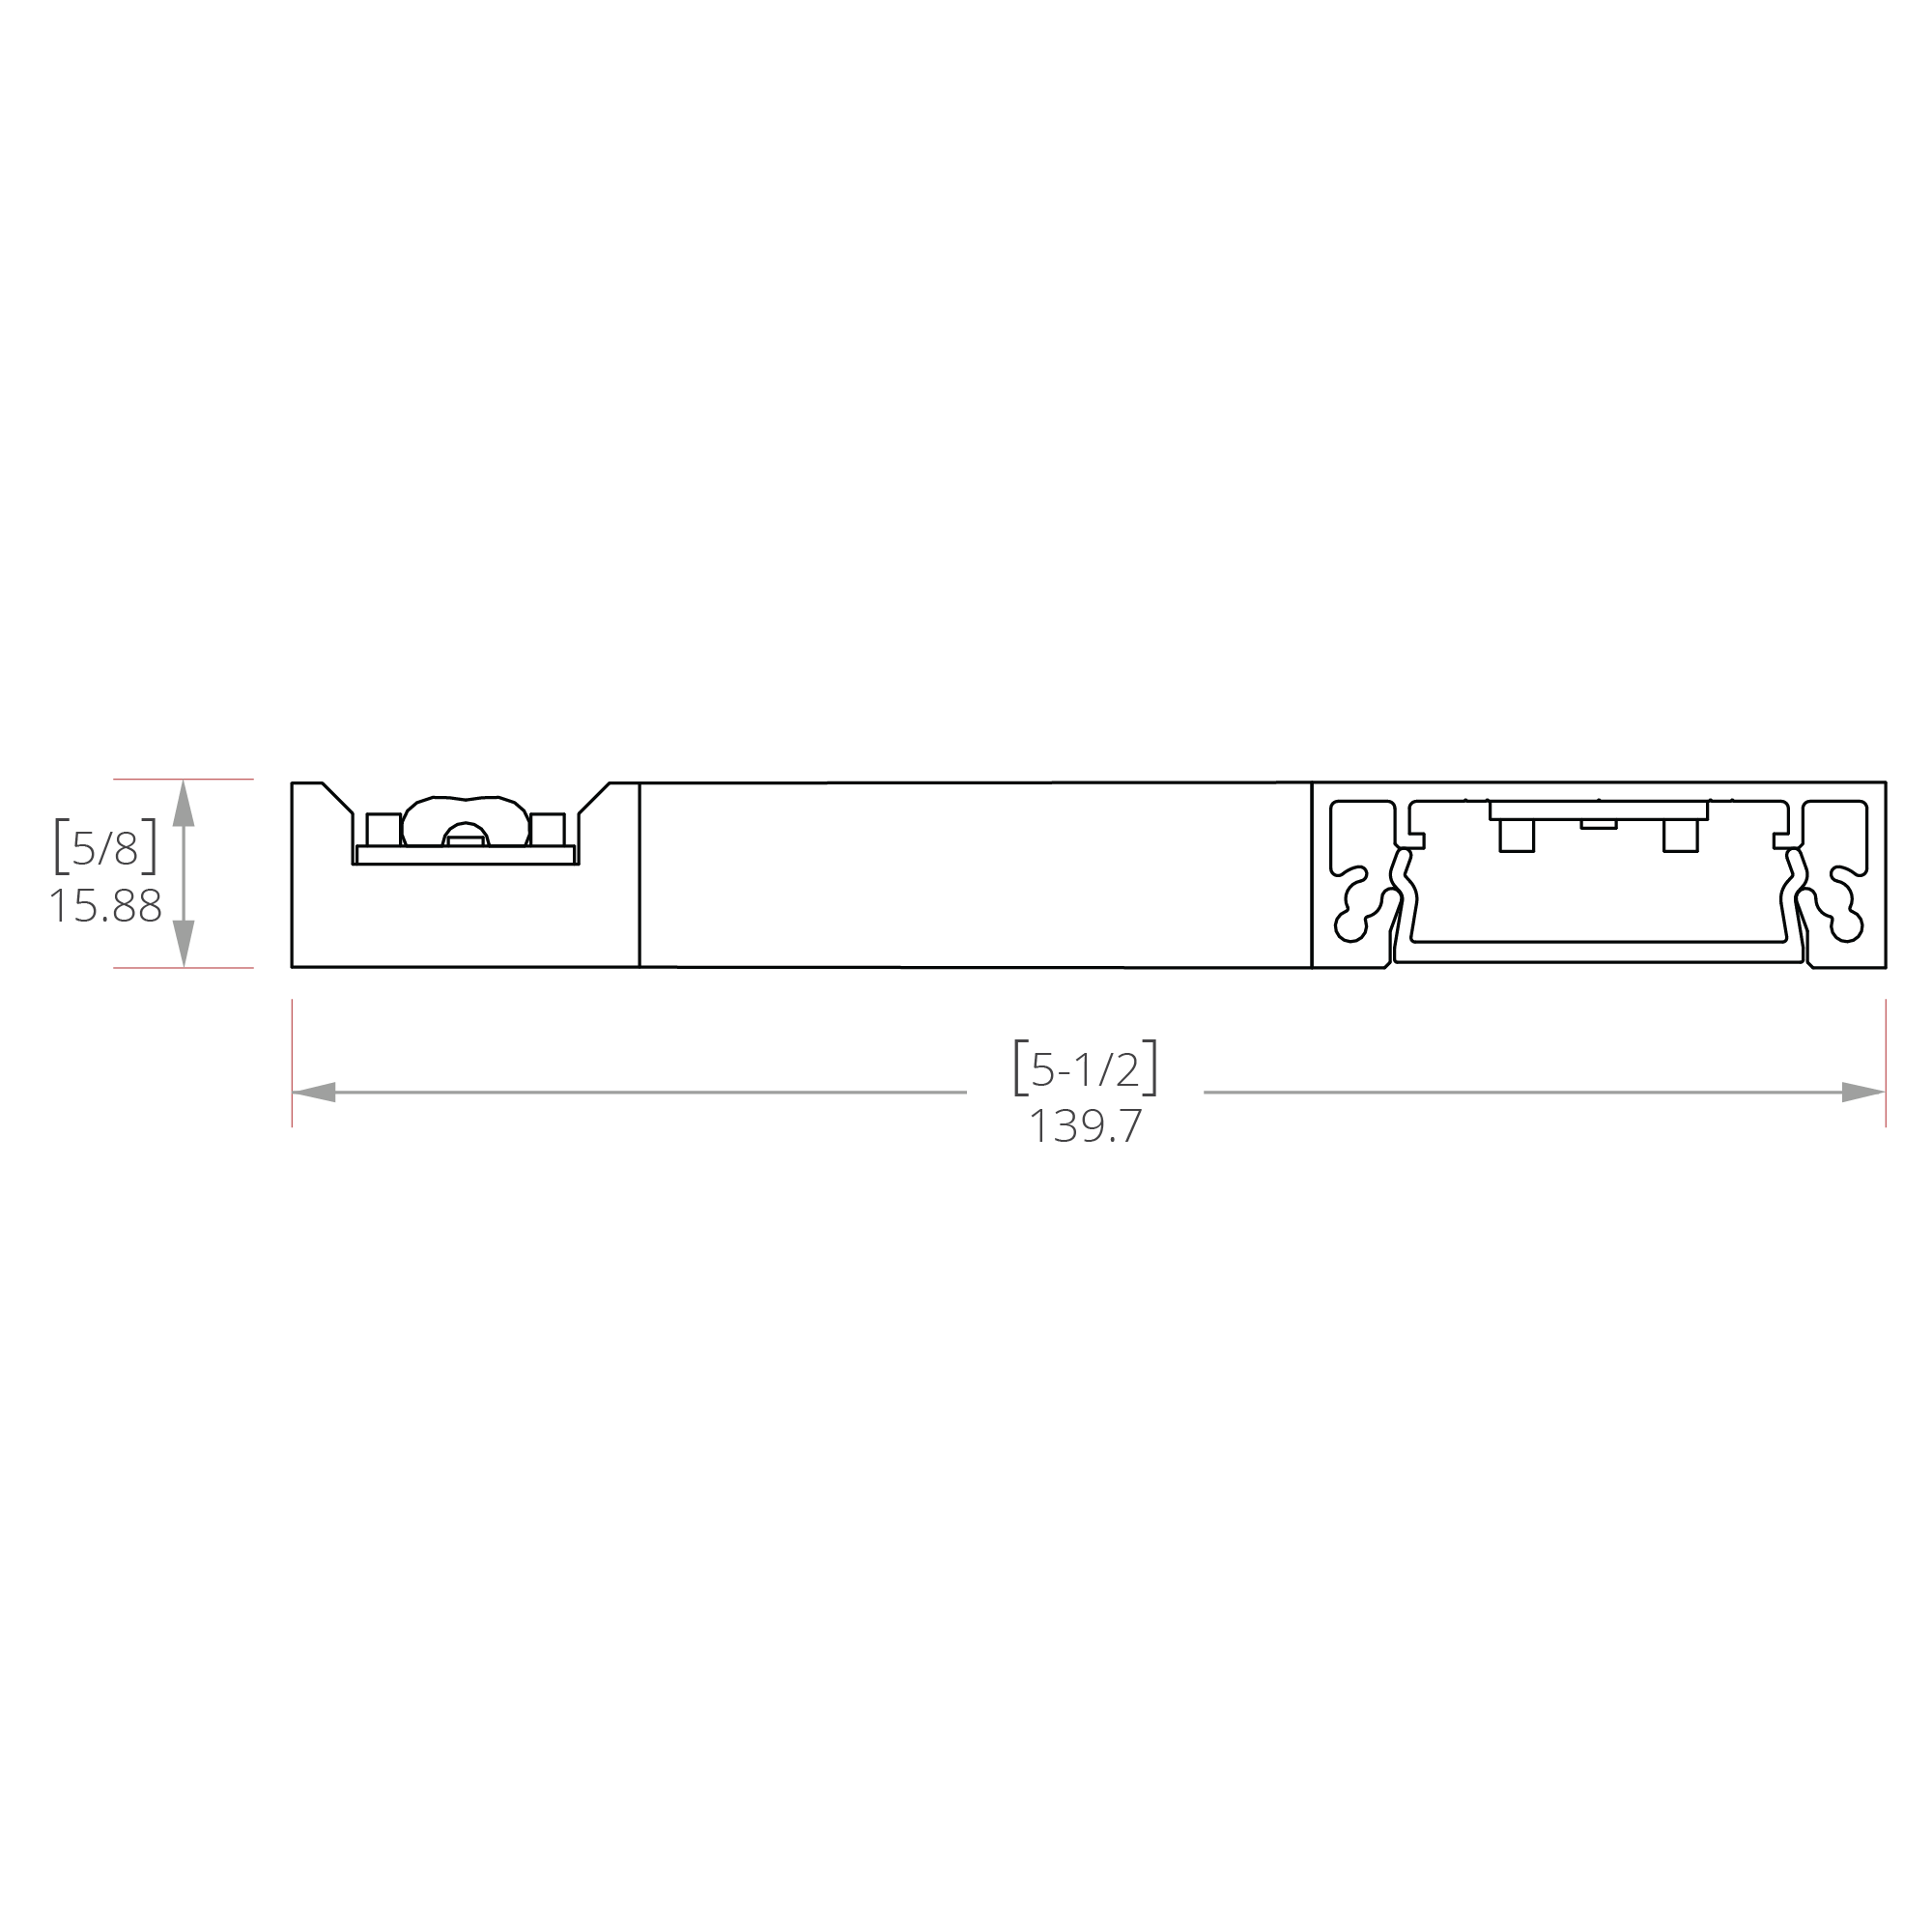 Tantalum Line Drawing